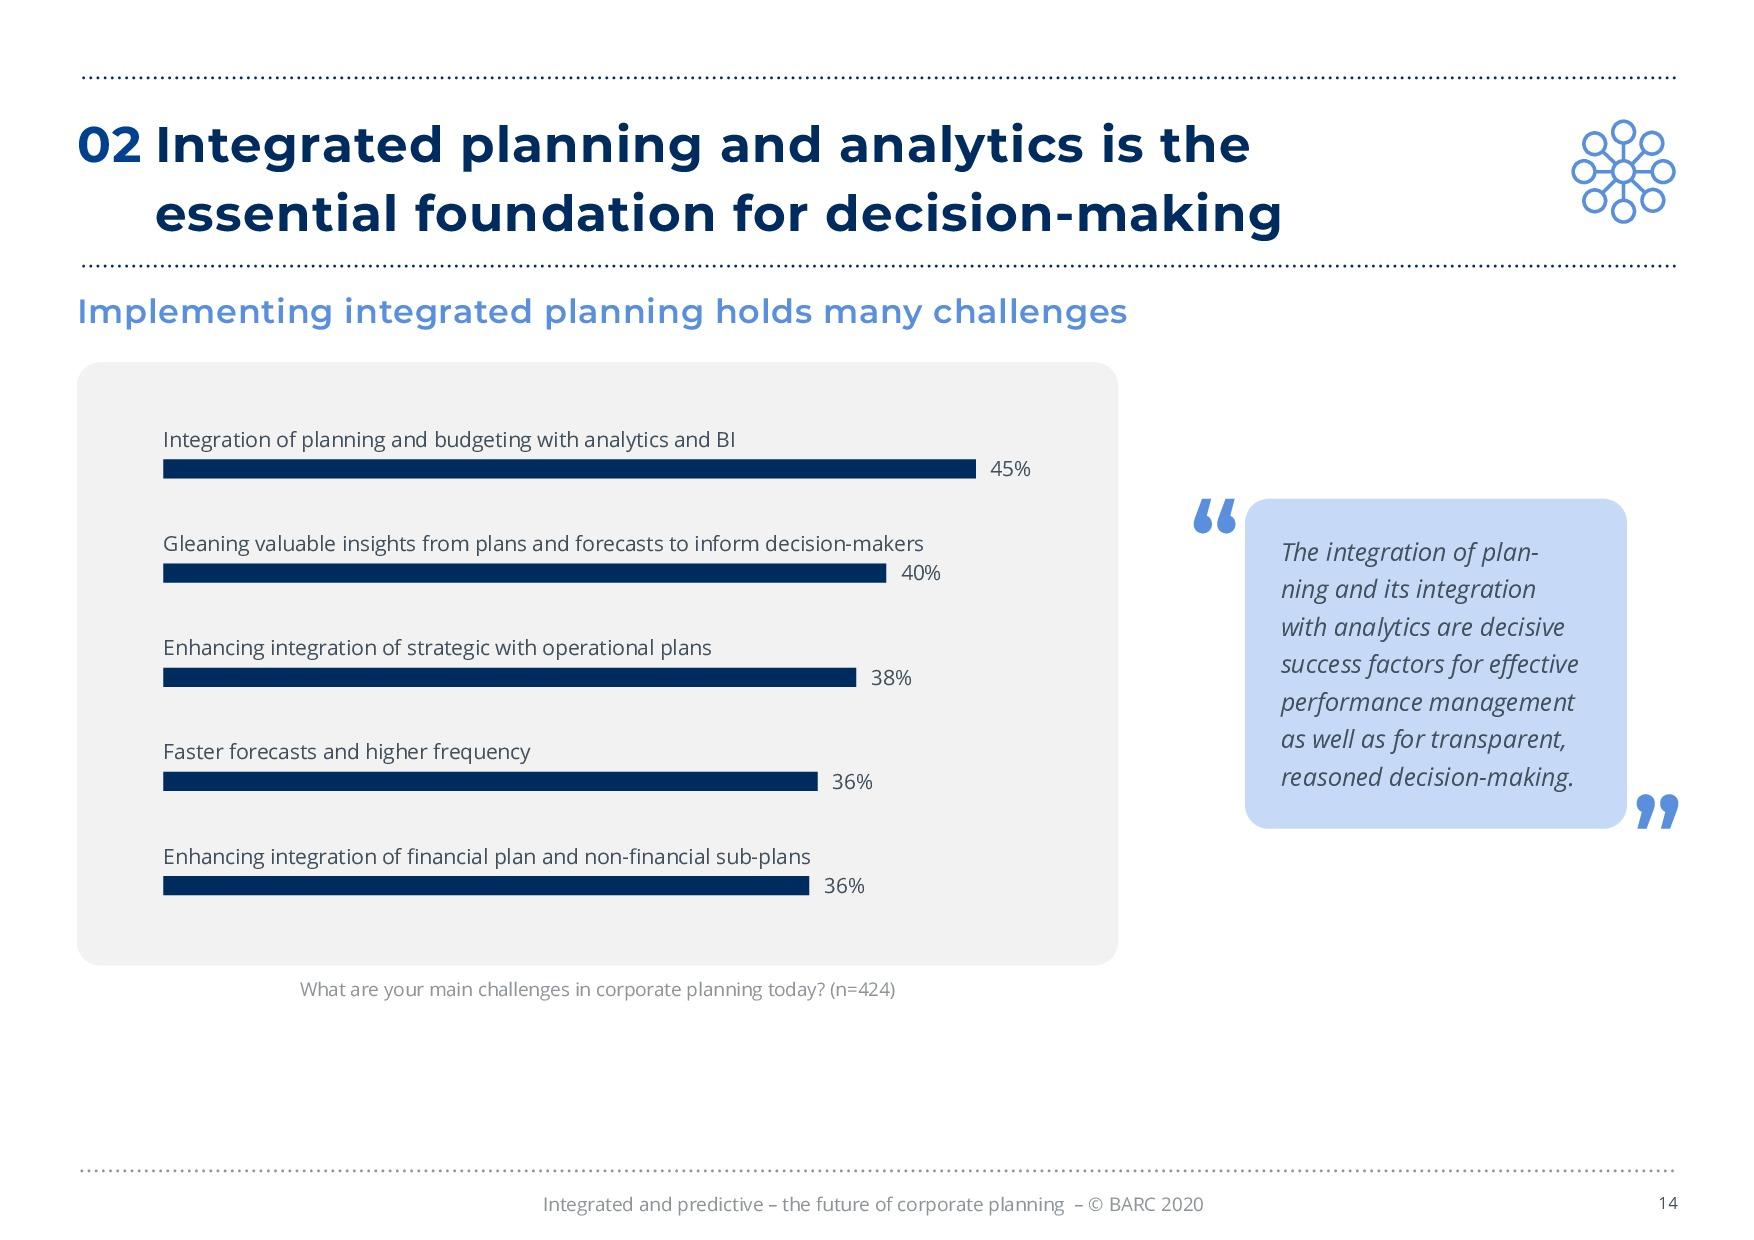 BARC – 統合と予測 – 経営計画の未来 | Page 14